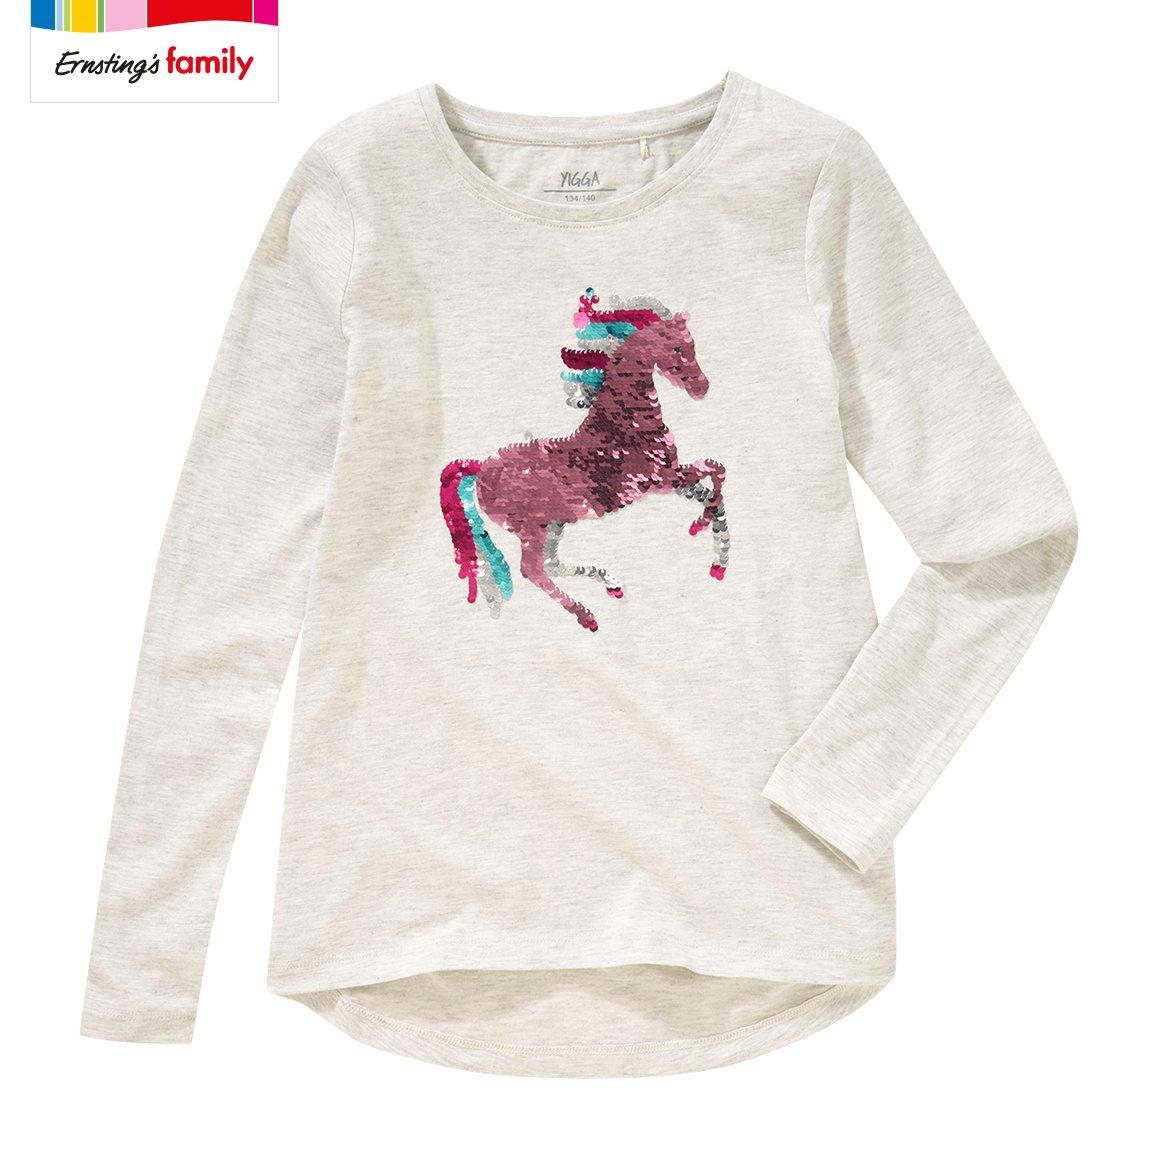 Kinder Mädchen Shirt